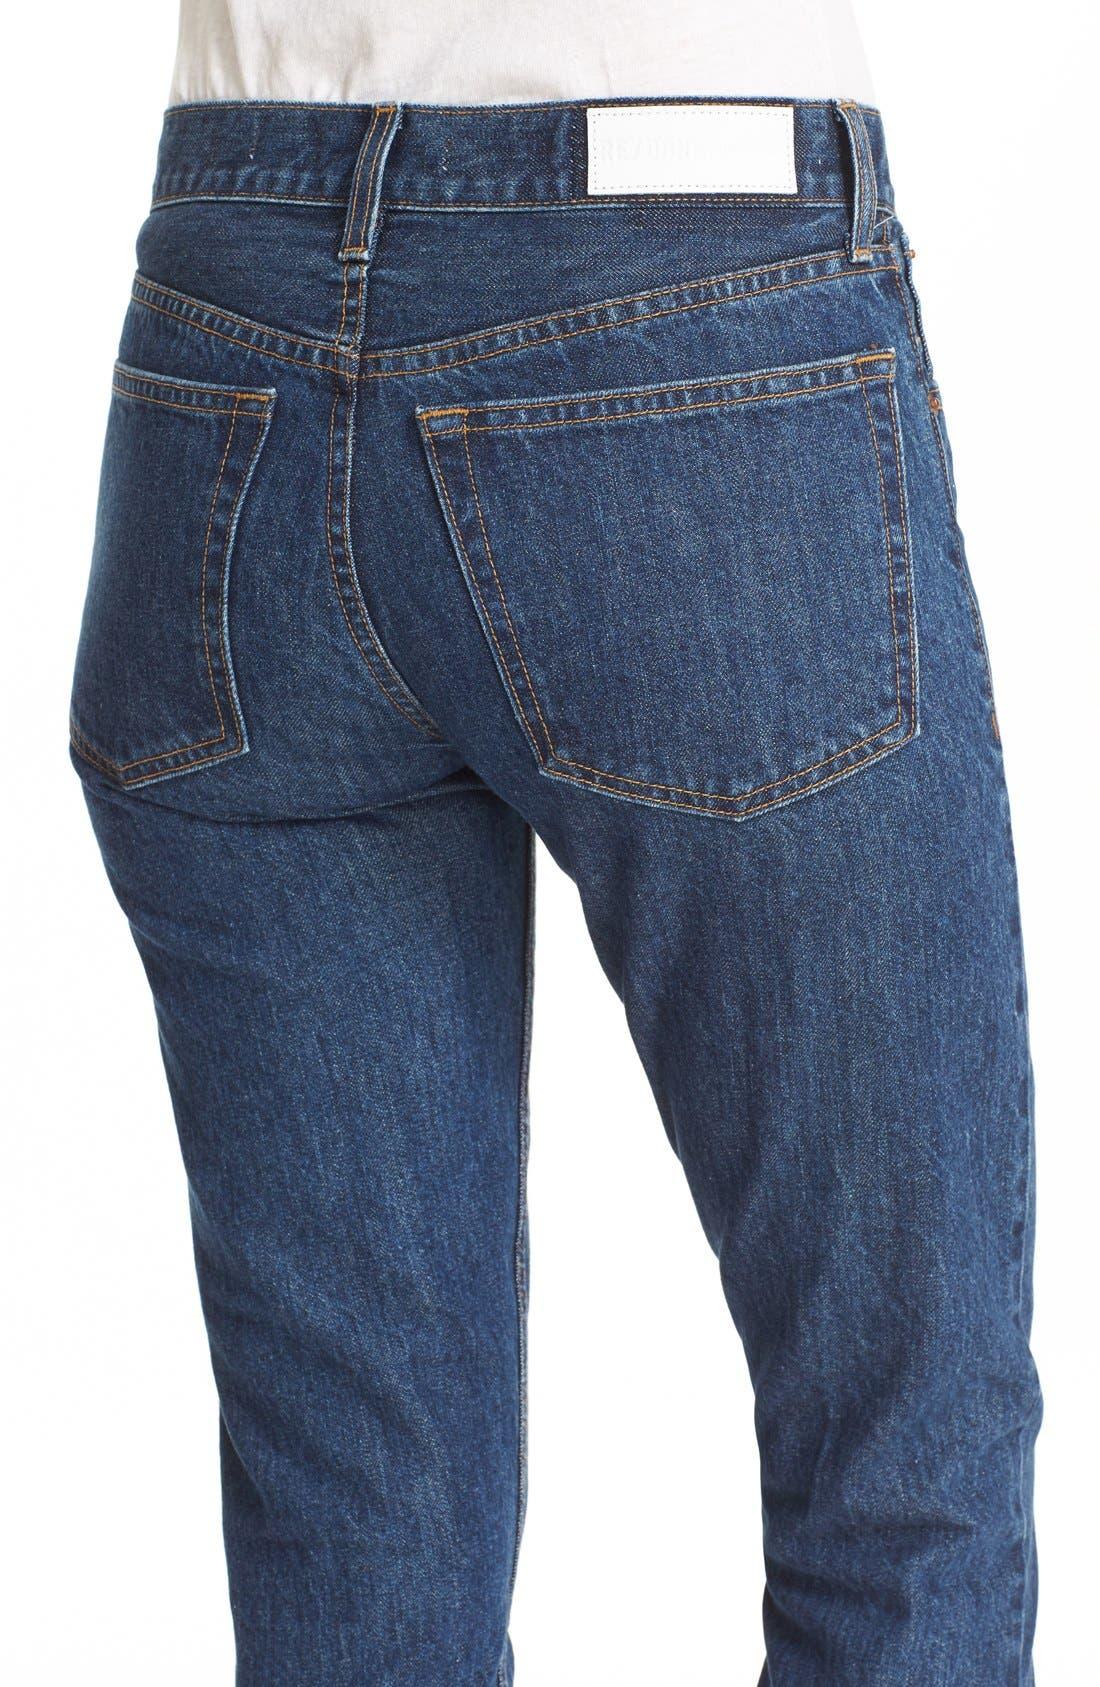 Alternate Image 4  - Re/Done 'Originals' Skinny Jeans